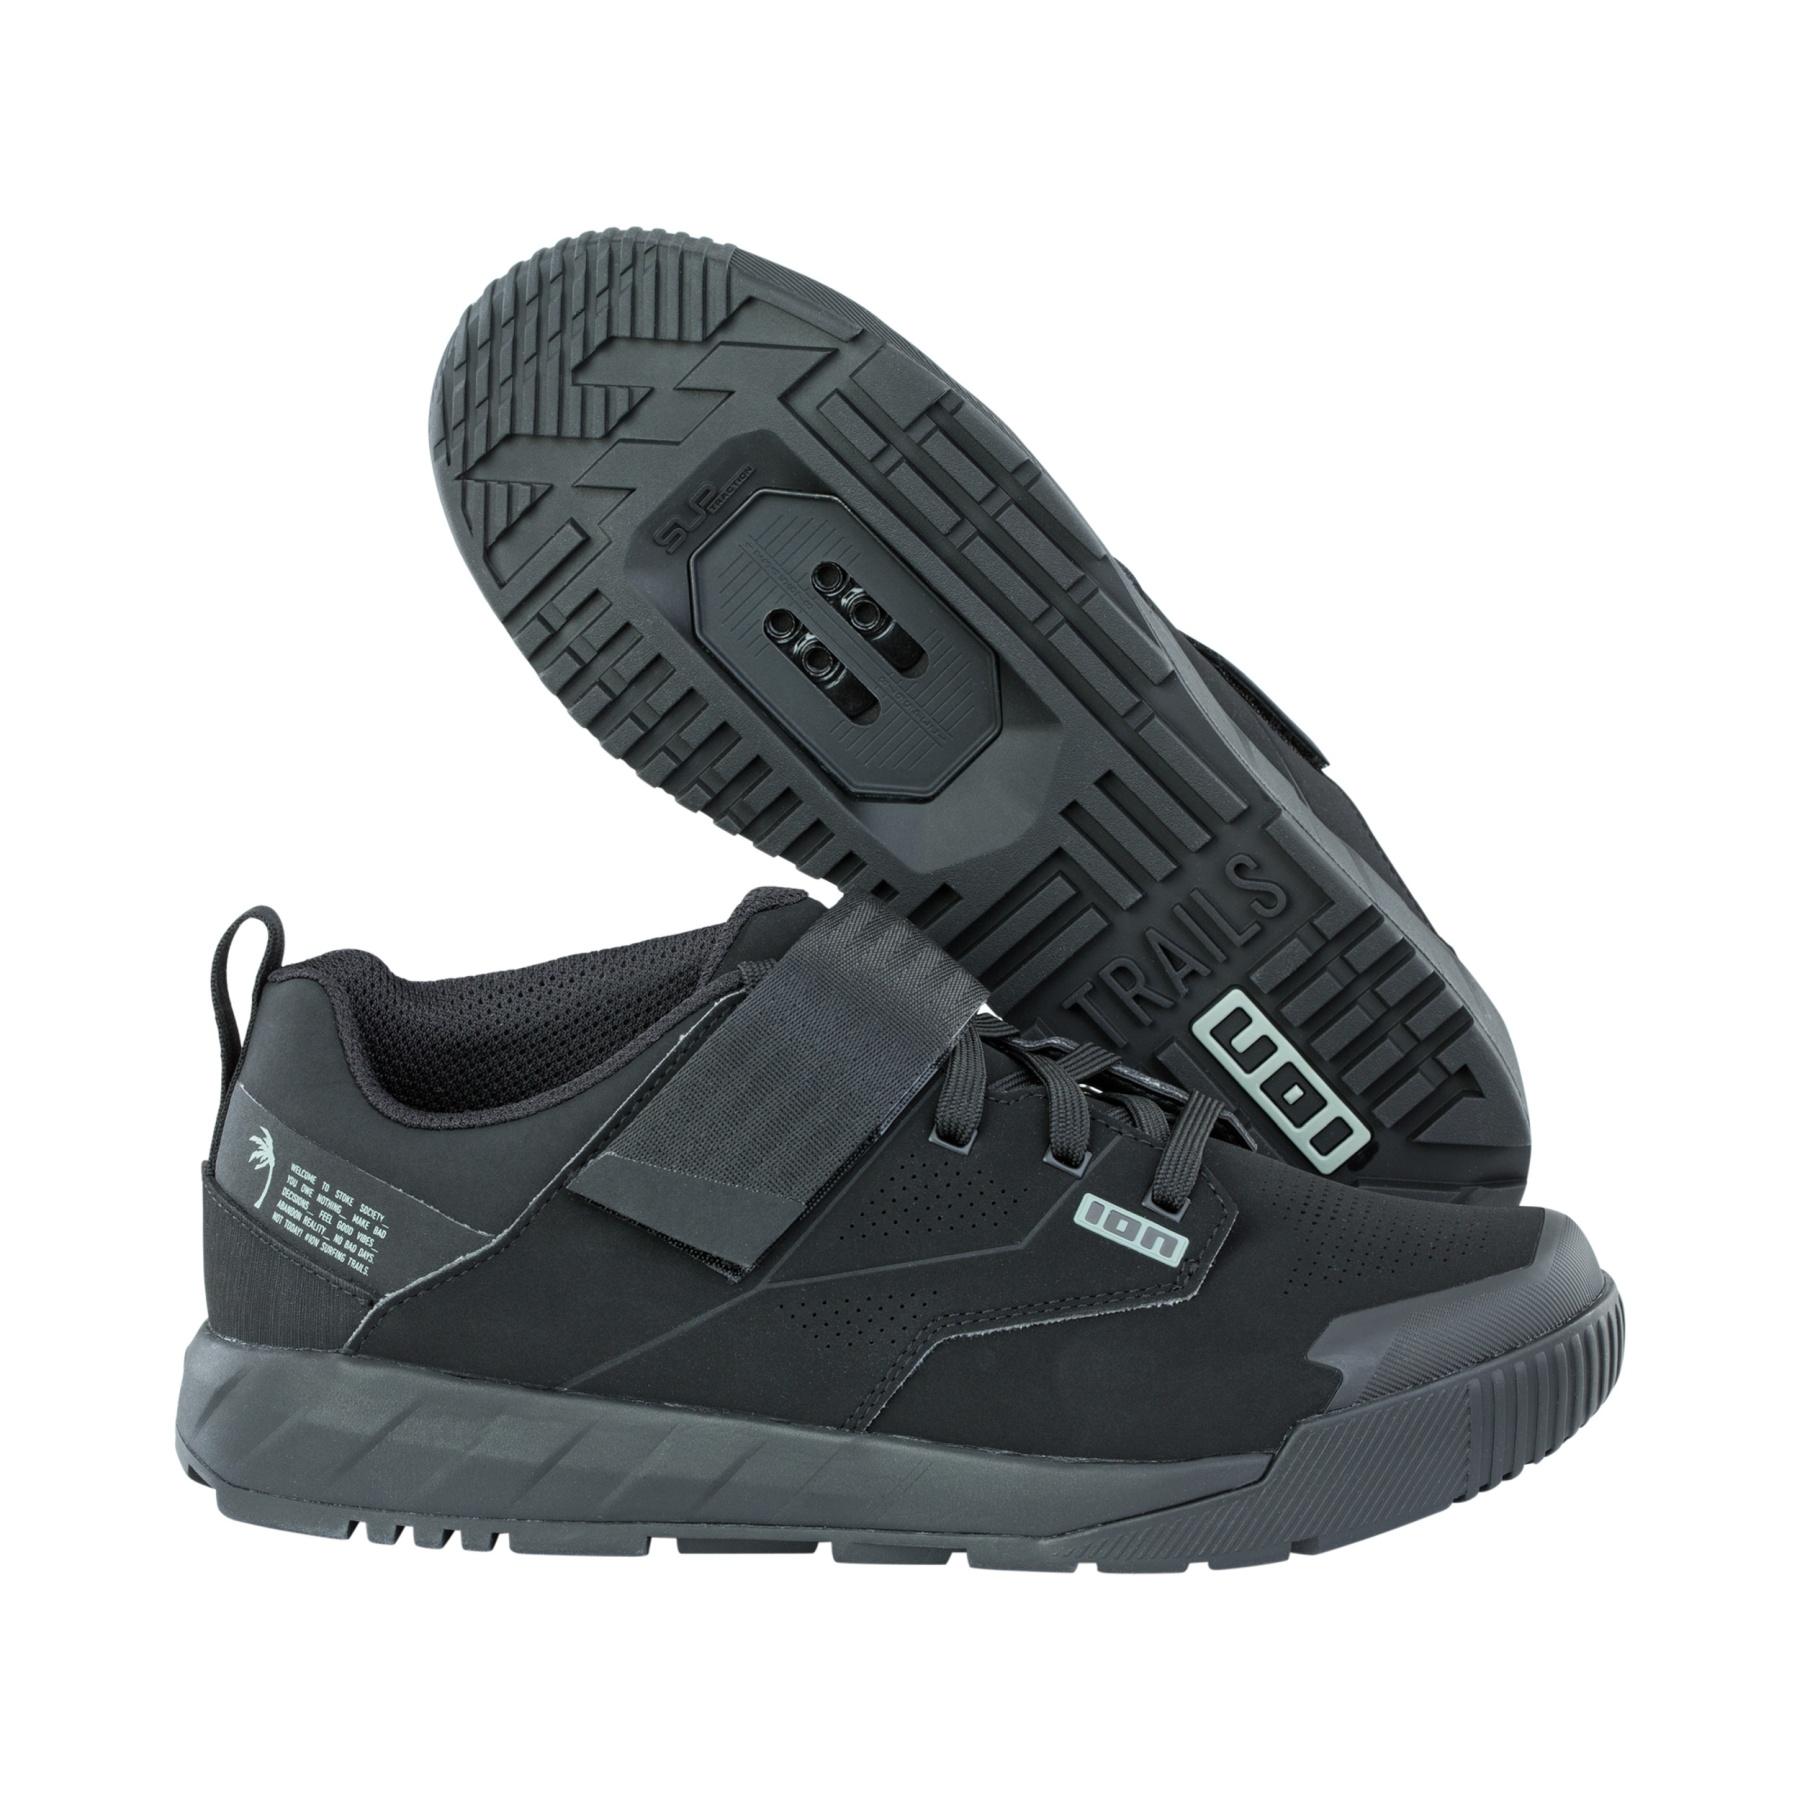 ION SPD Bike Shoes Rascal Amp for MTB - Black